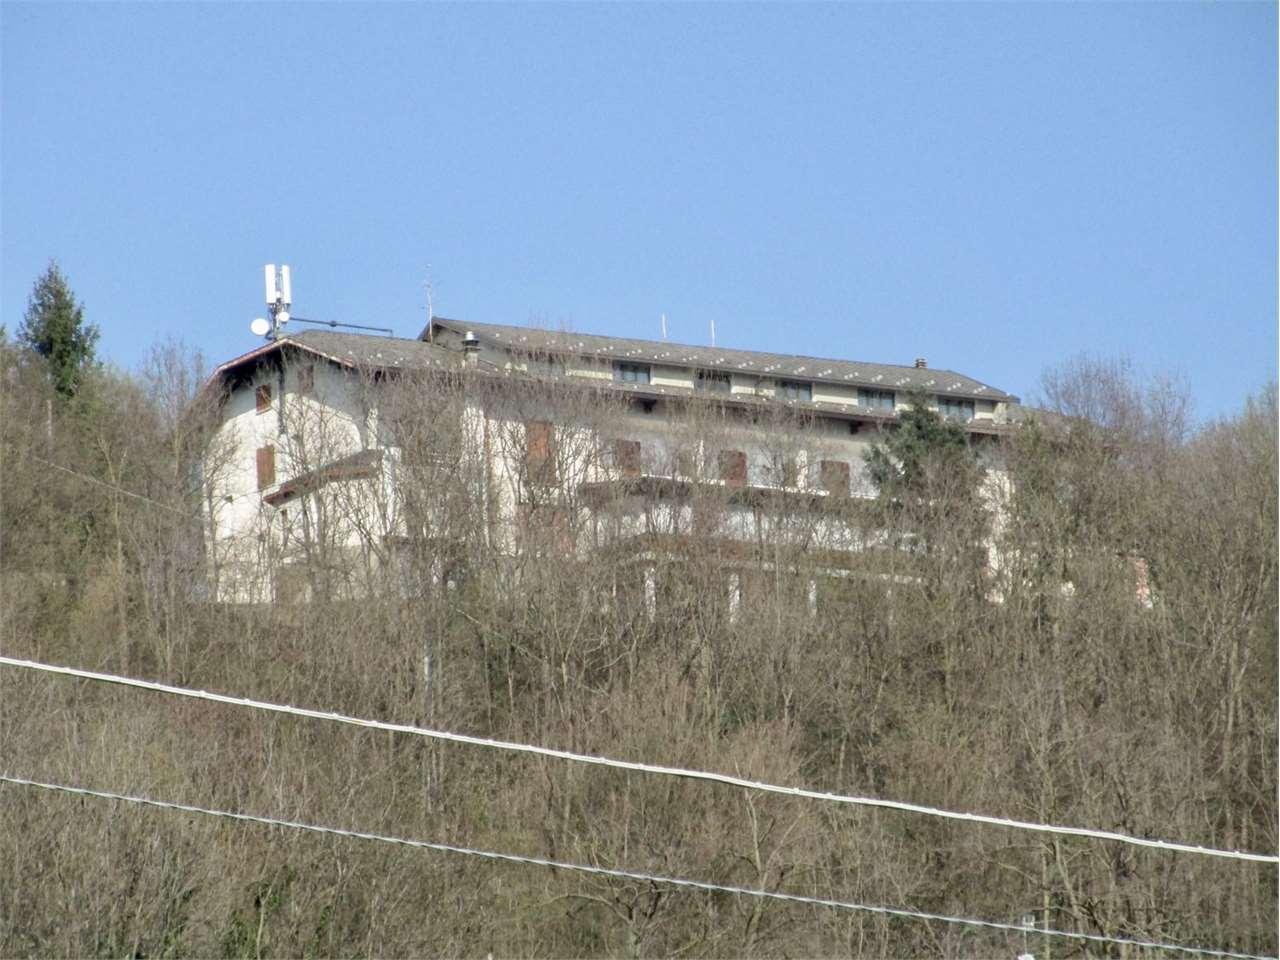 Hotel/Albergo in vendita - 1650 mq